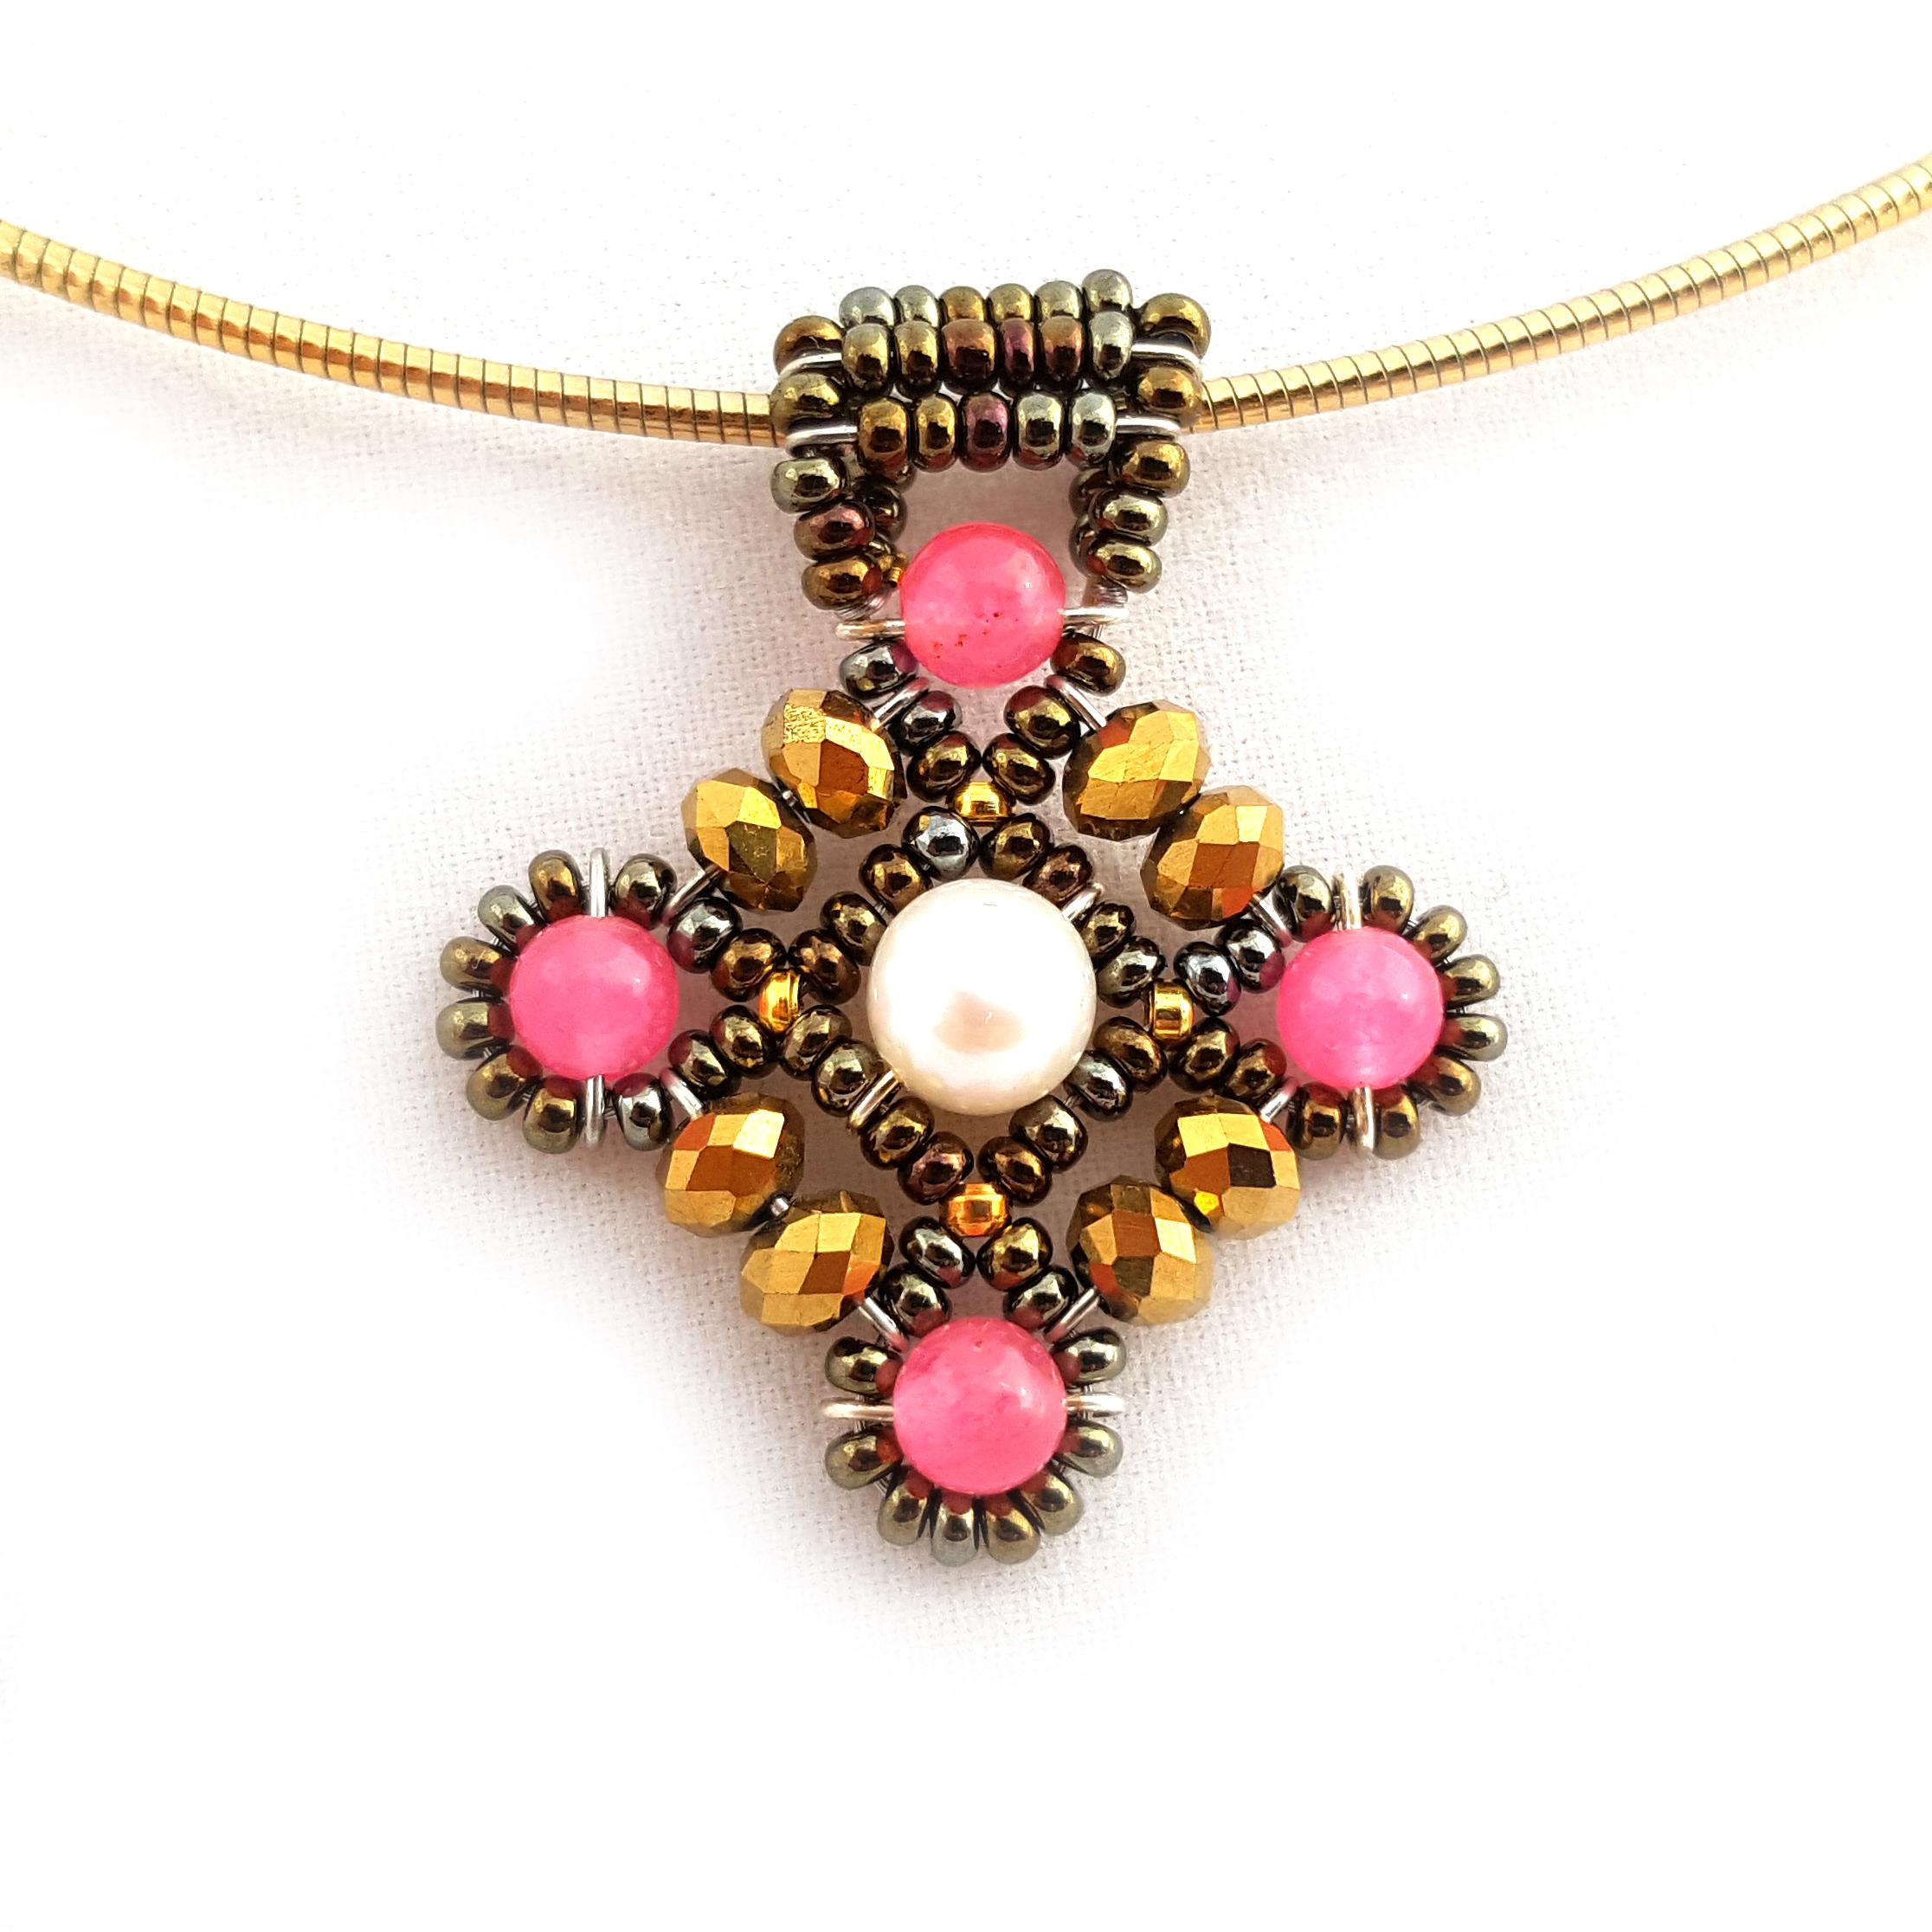 PEN84 - Hermes Pink--20161109_130109.jpg